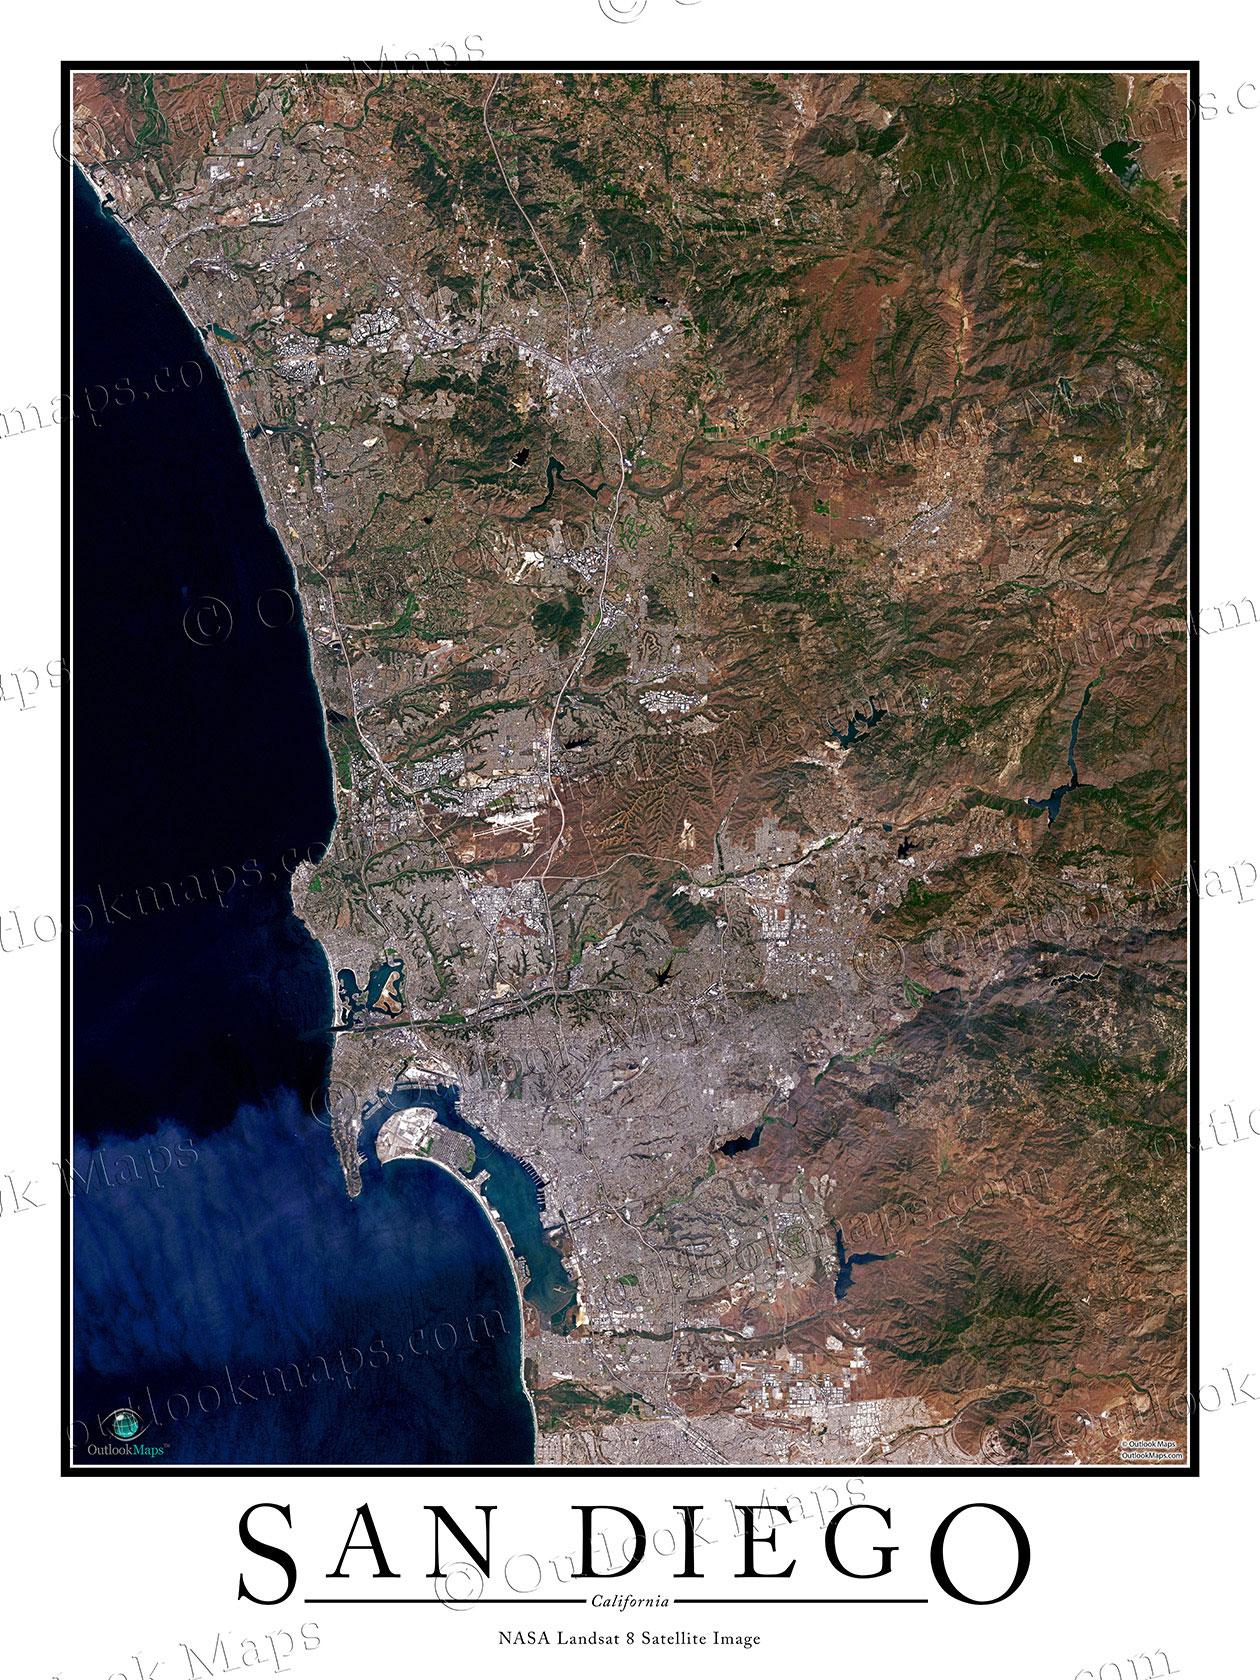 CA San Diego Camping San Diego Hostels Hiking Maps Biking San - Jo mora los angeles map